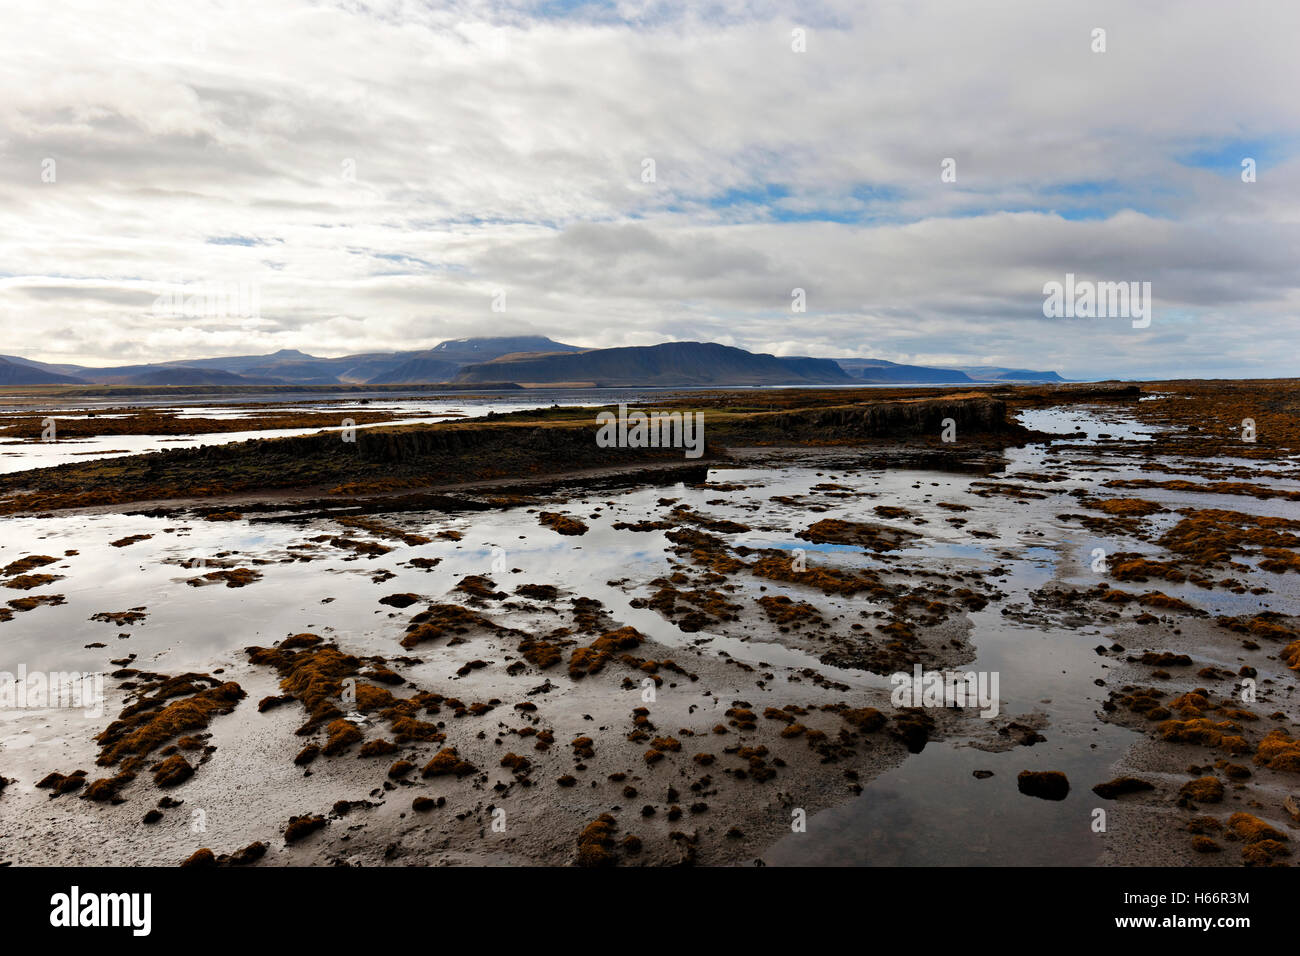 Fjord landscape, West Iceland, North Atlantic, Europe - Stock Image